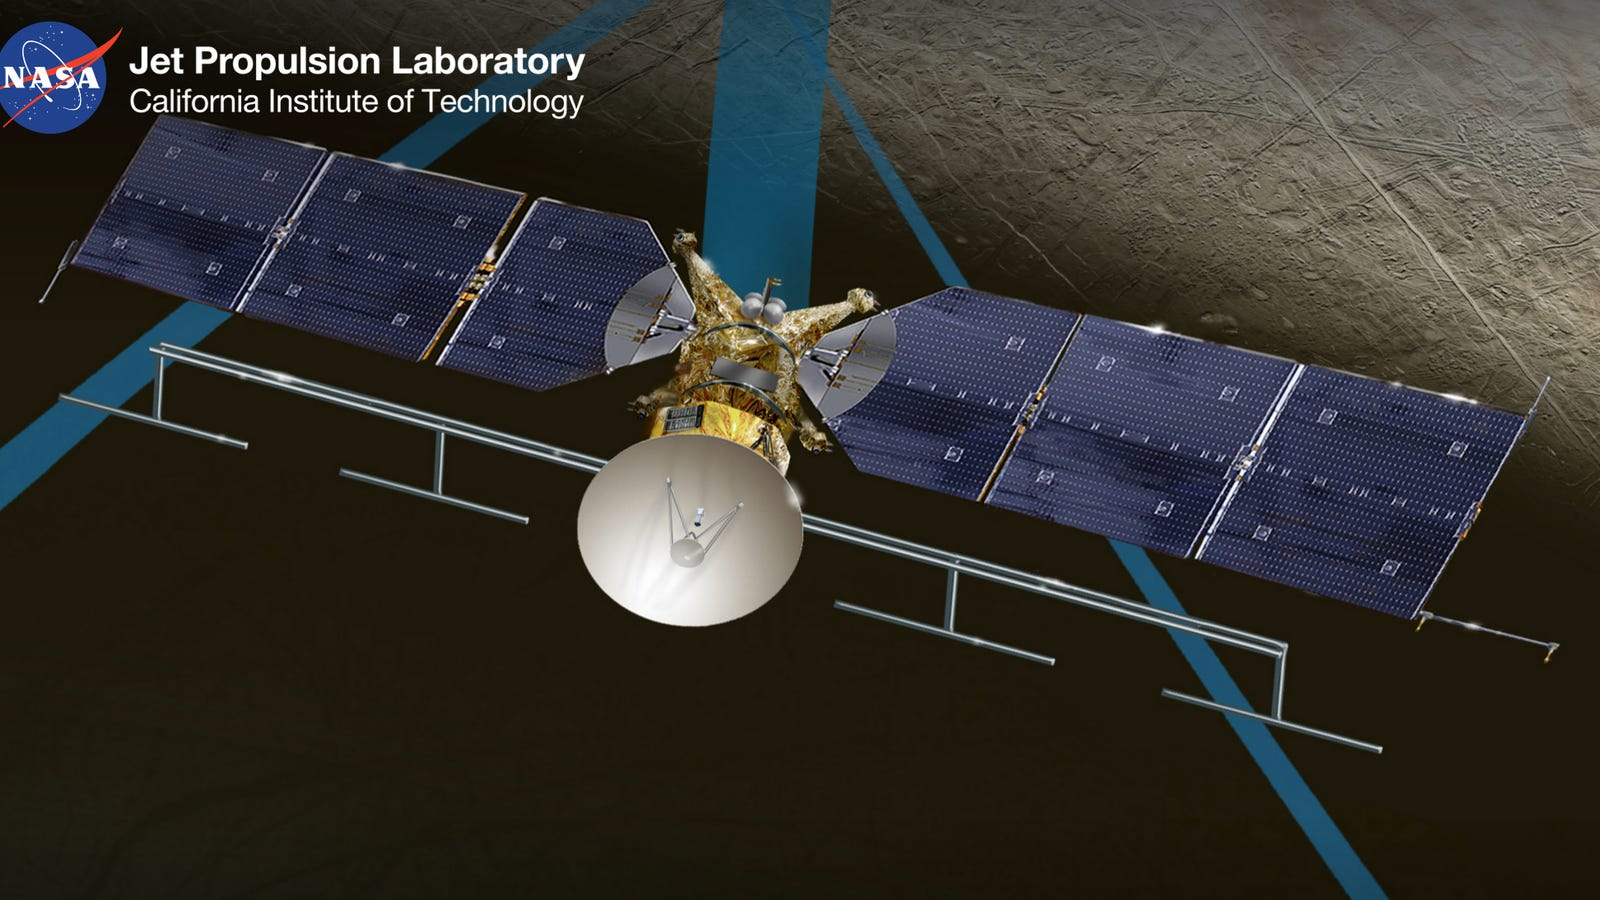 NASA May Soon Send This Spacecraft to Jupiter's Moon Europa